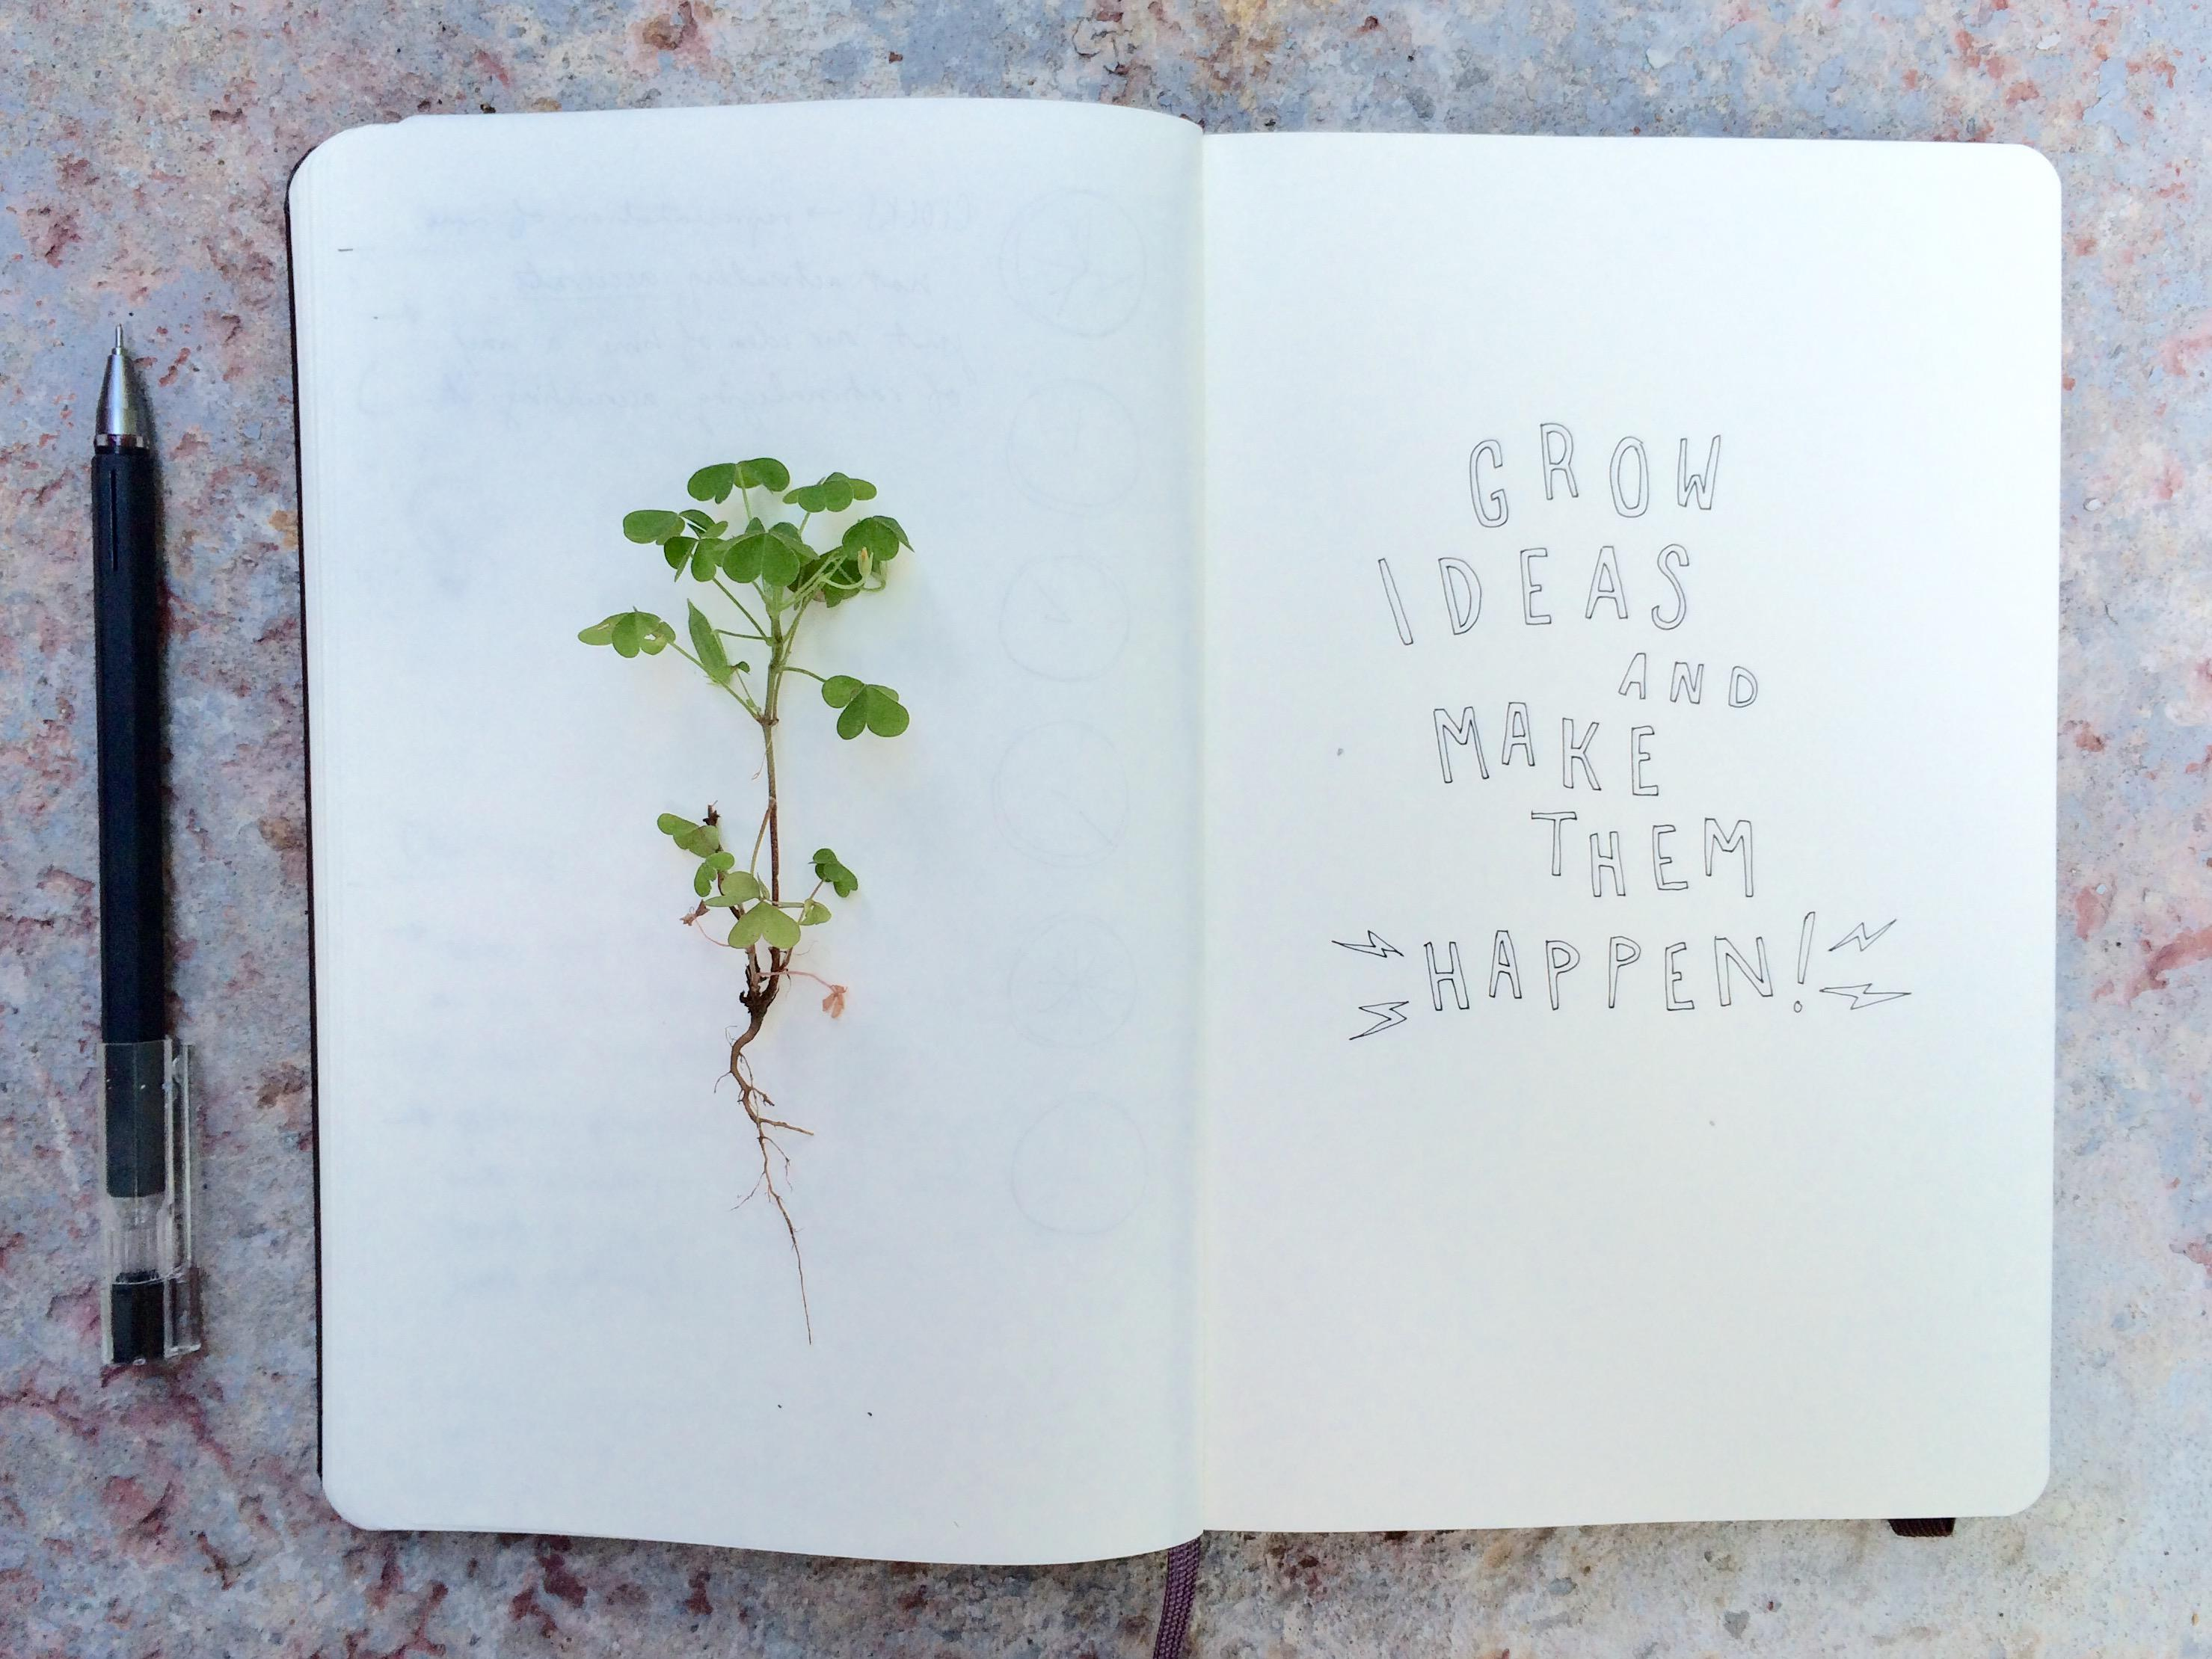 Grow Ideas + Make Them Happen - image 5 - student project